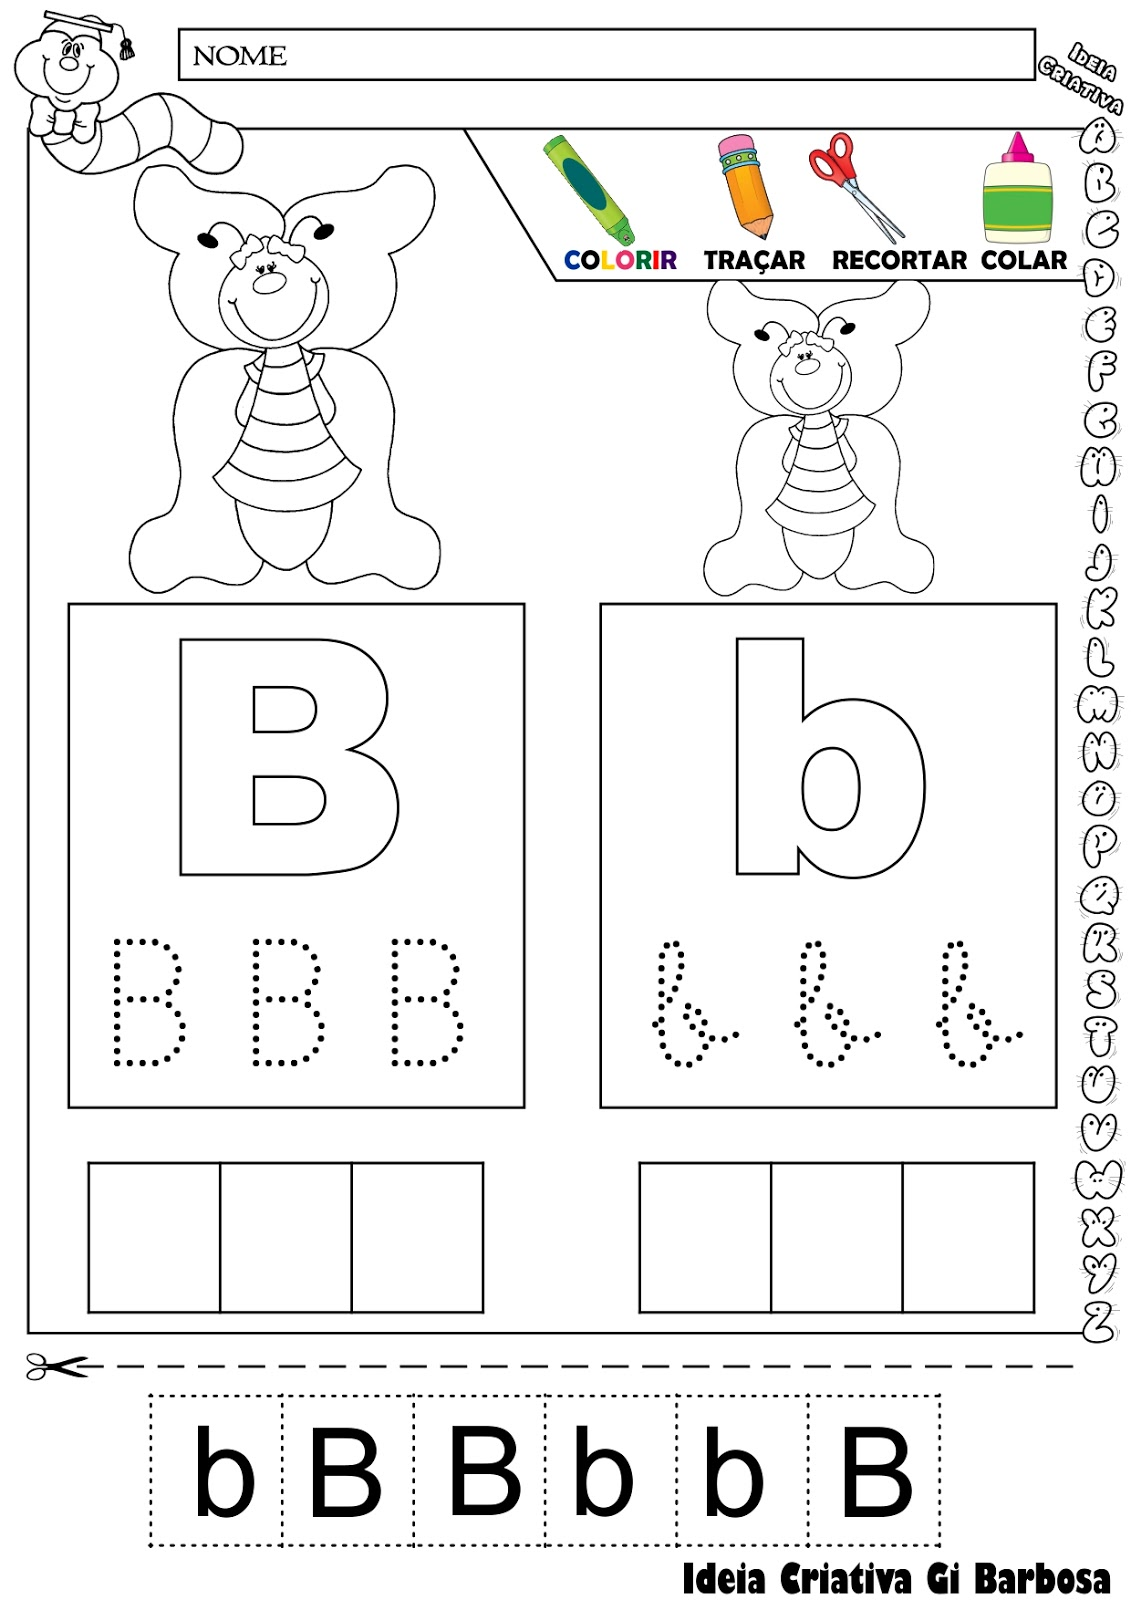 Atividade Letra B Colorir Traçar Recortar e Colar